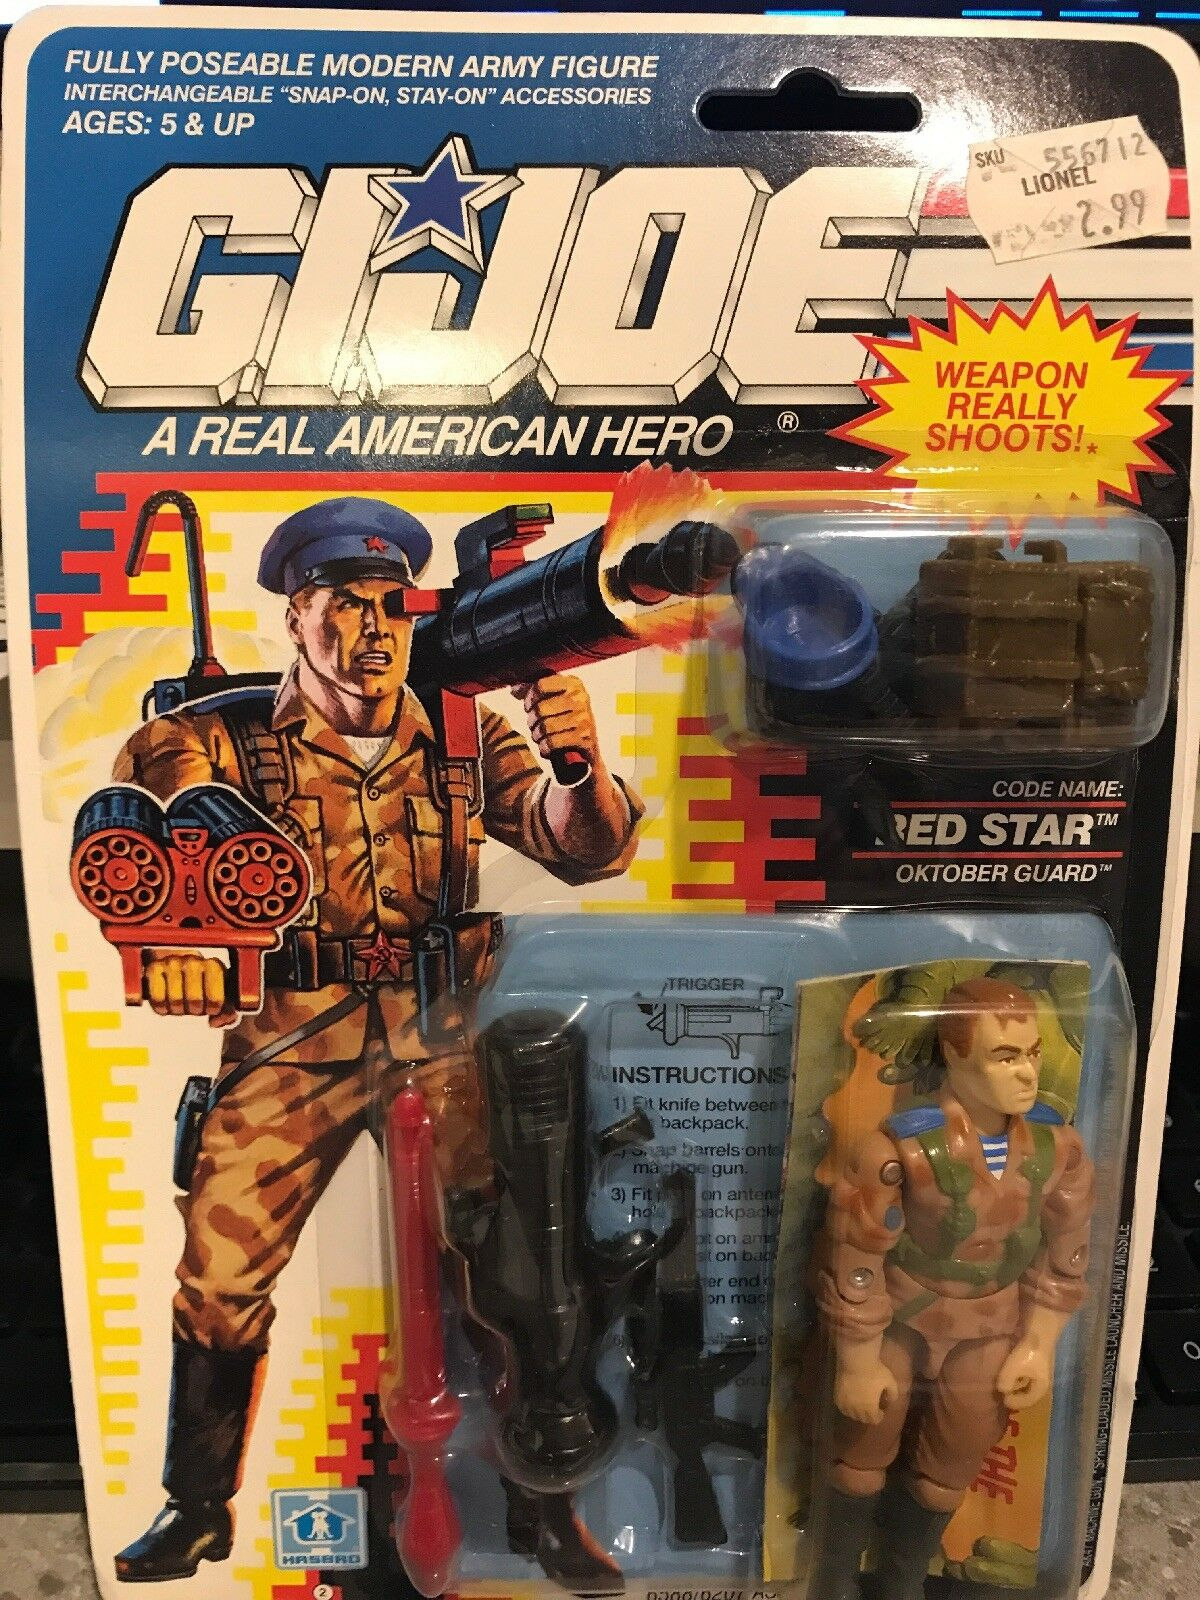 NEW Hasbro GI Joe Red Star Oktober Guard New in Blister